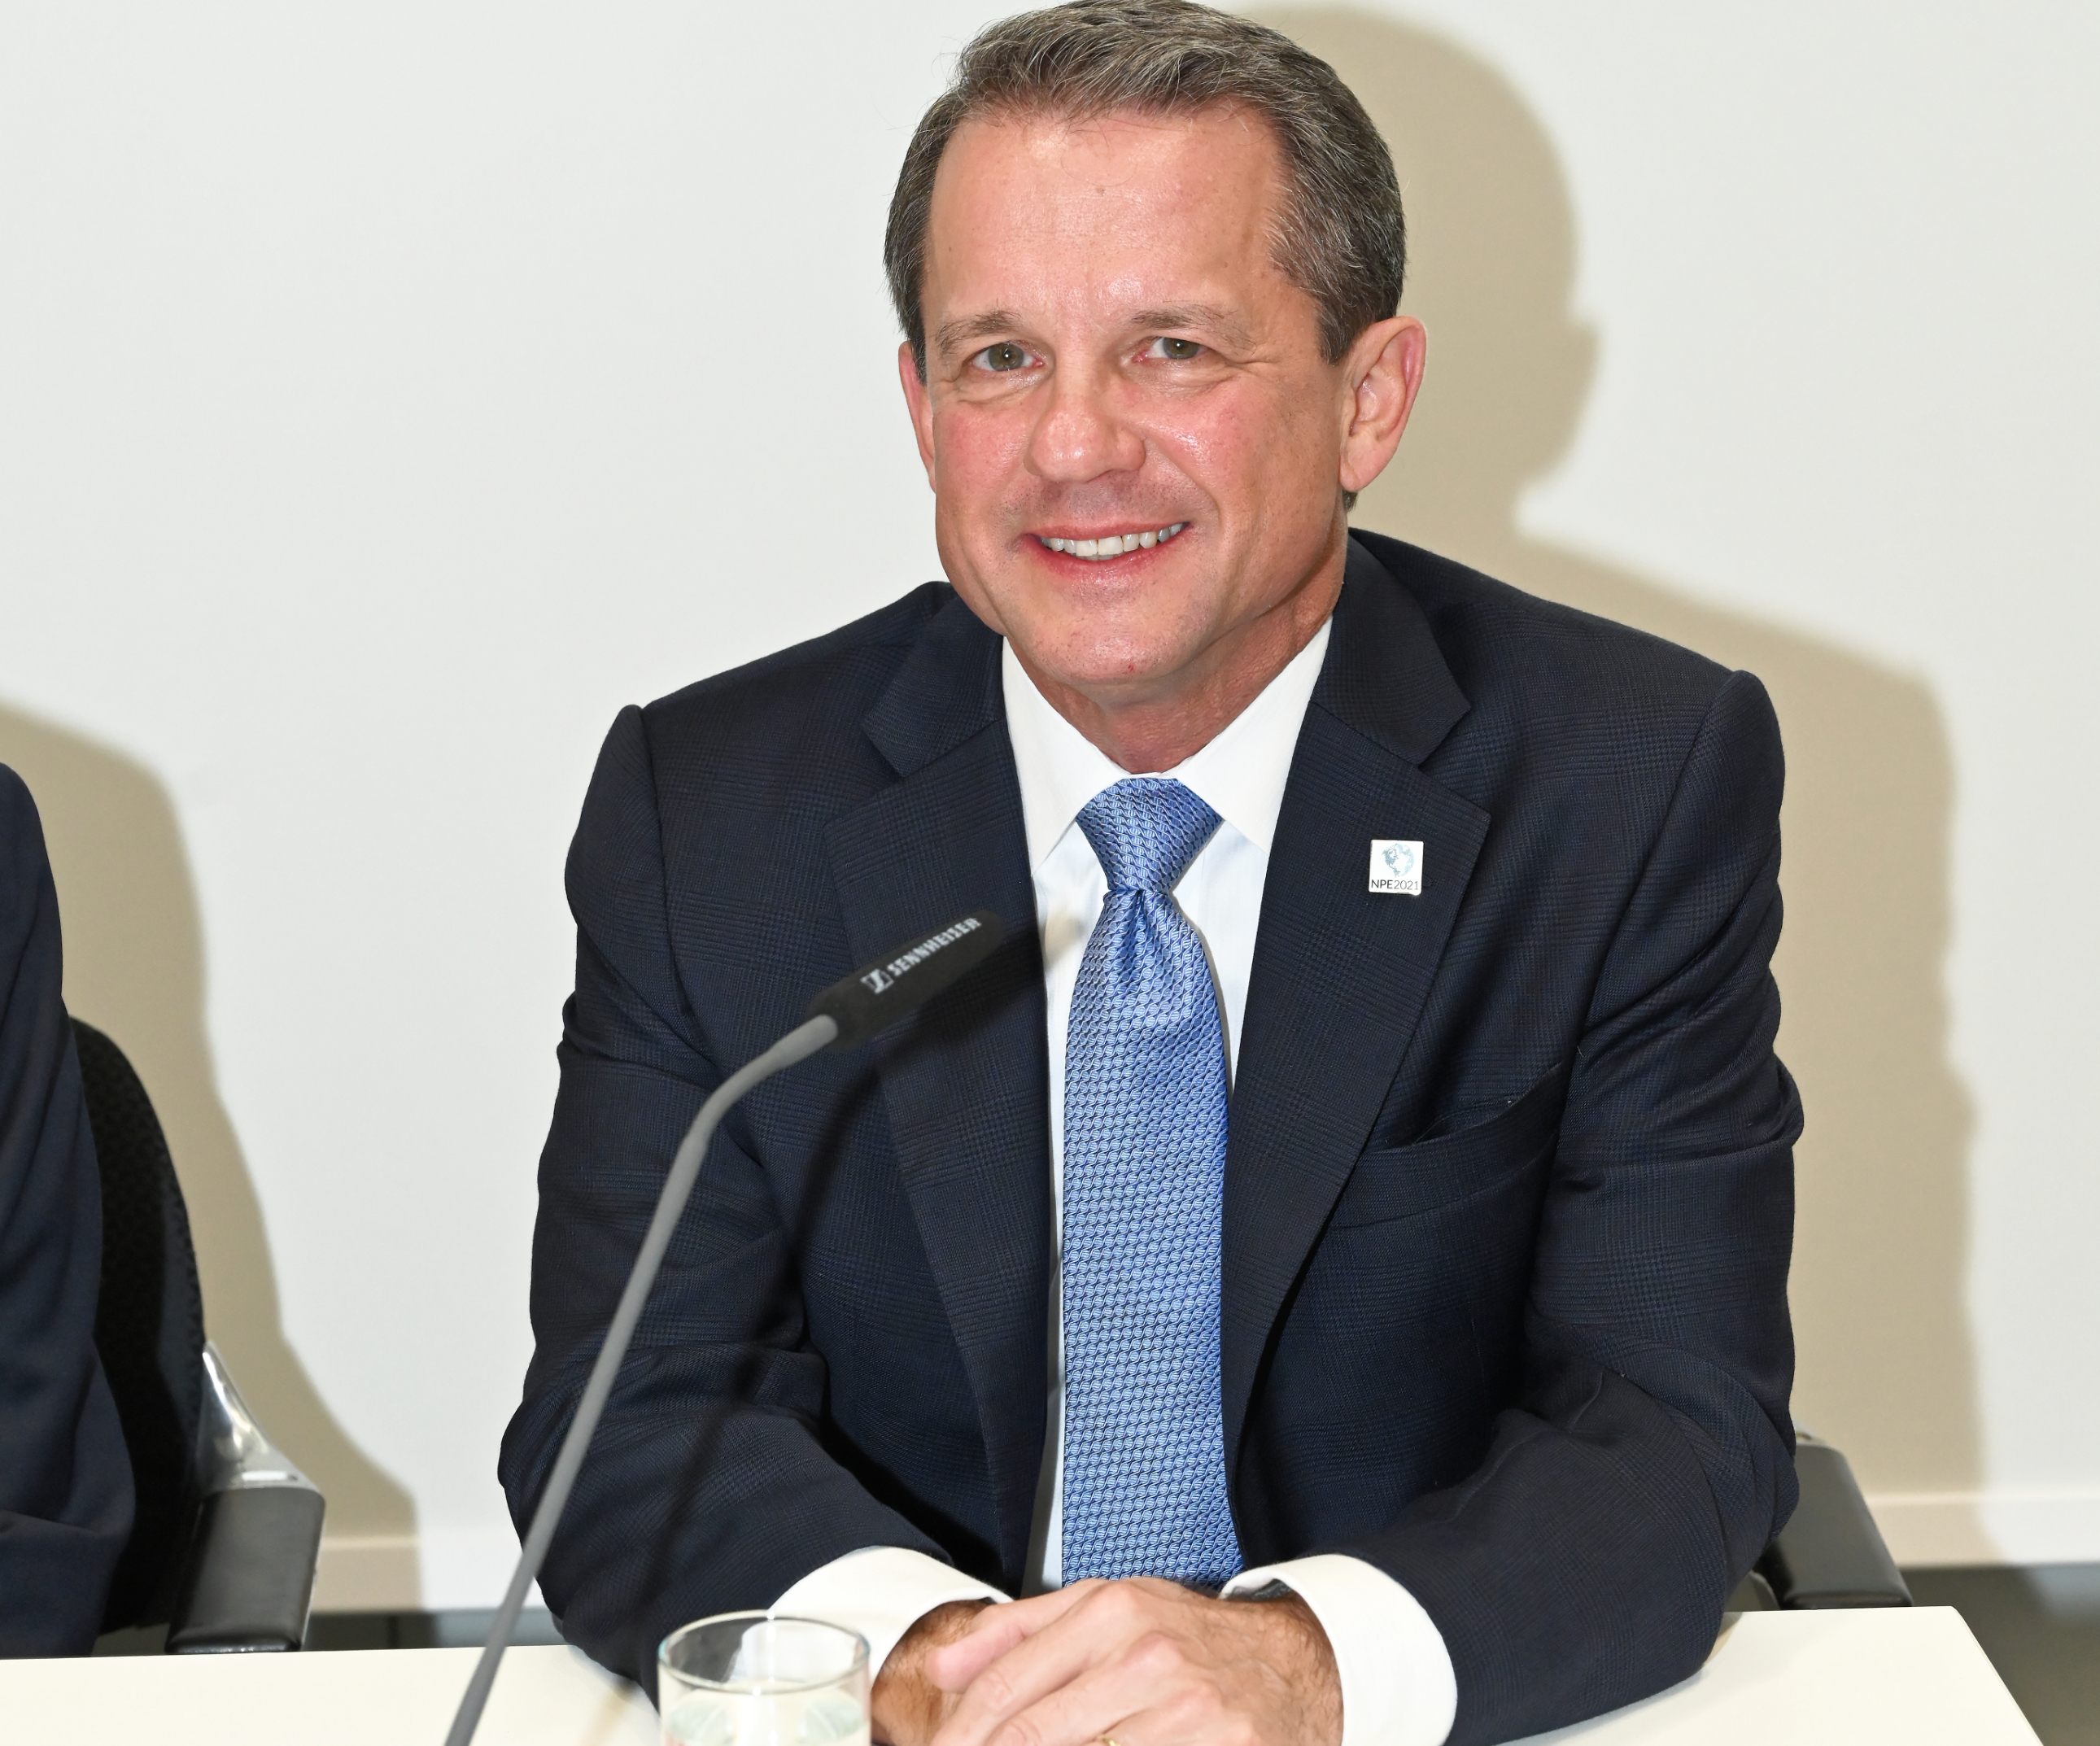 Tony Radoszewski Plastics Industry Association president and CEO